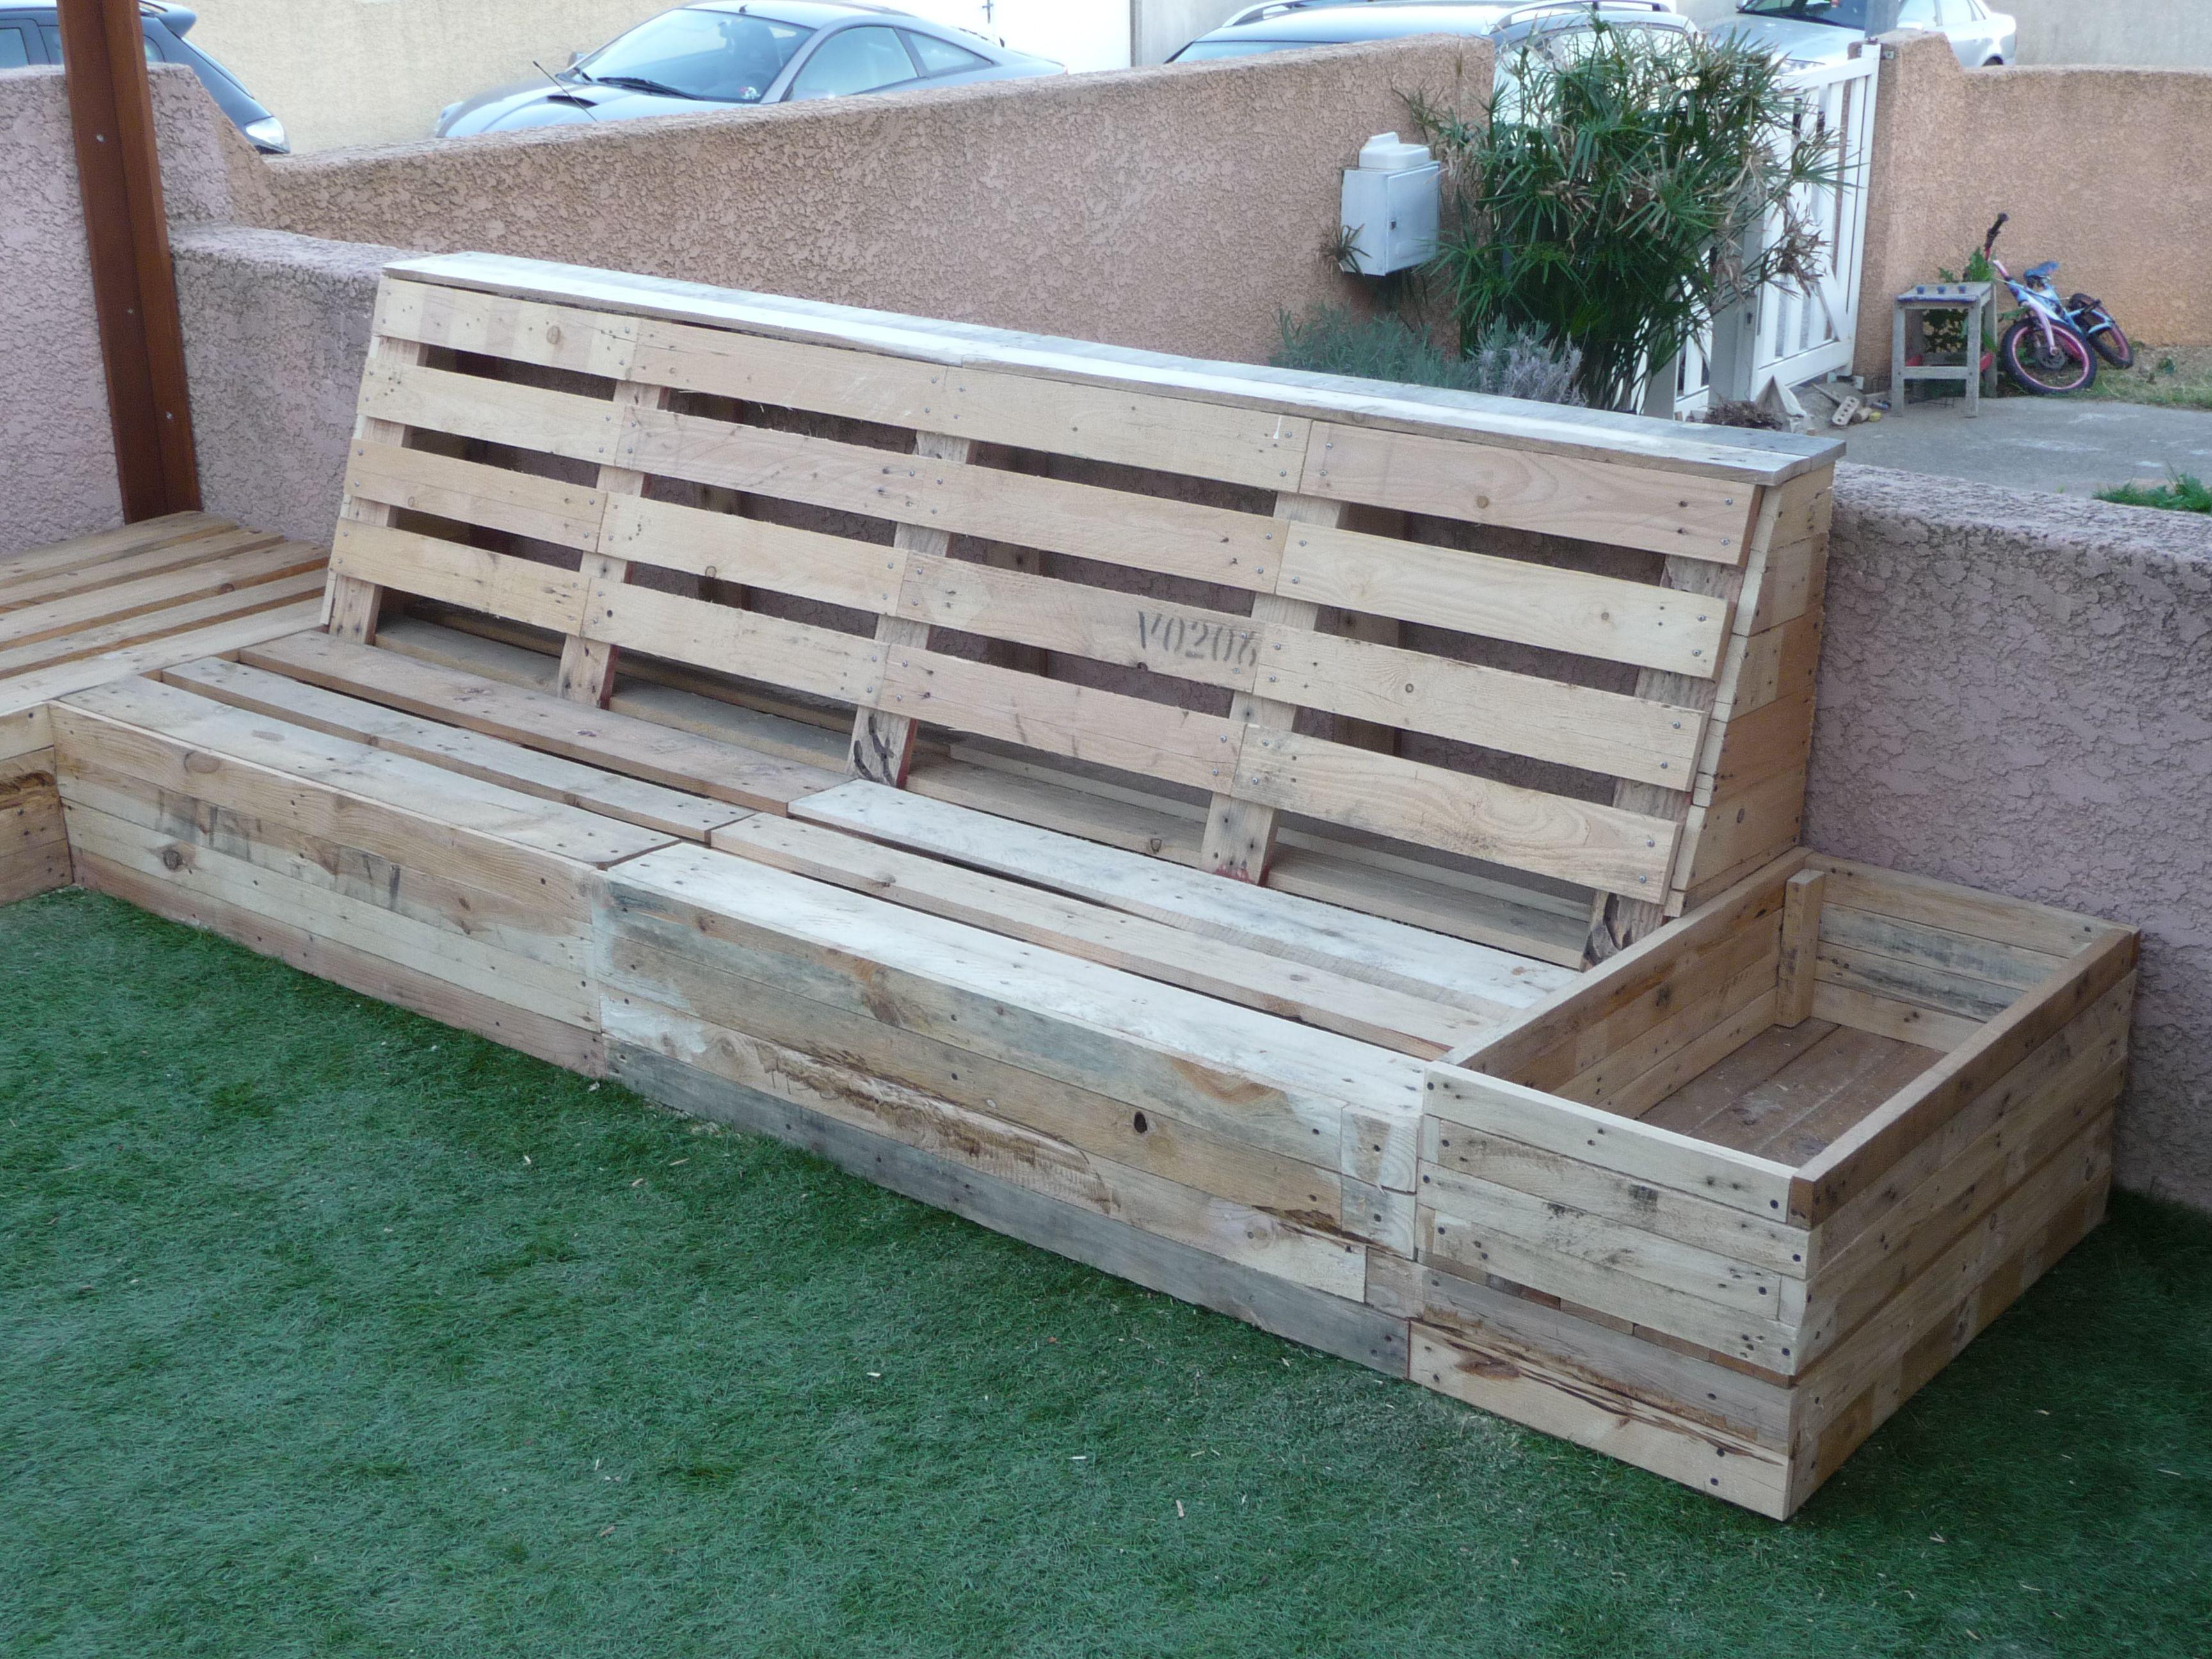 Complete Pallet Garden Set Pallet Ideas 1001 Pallets: Complete Pallet Garden Set • Pallet Ideas